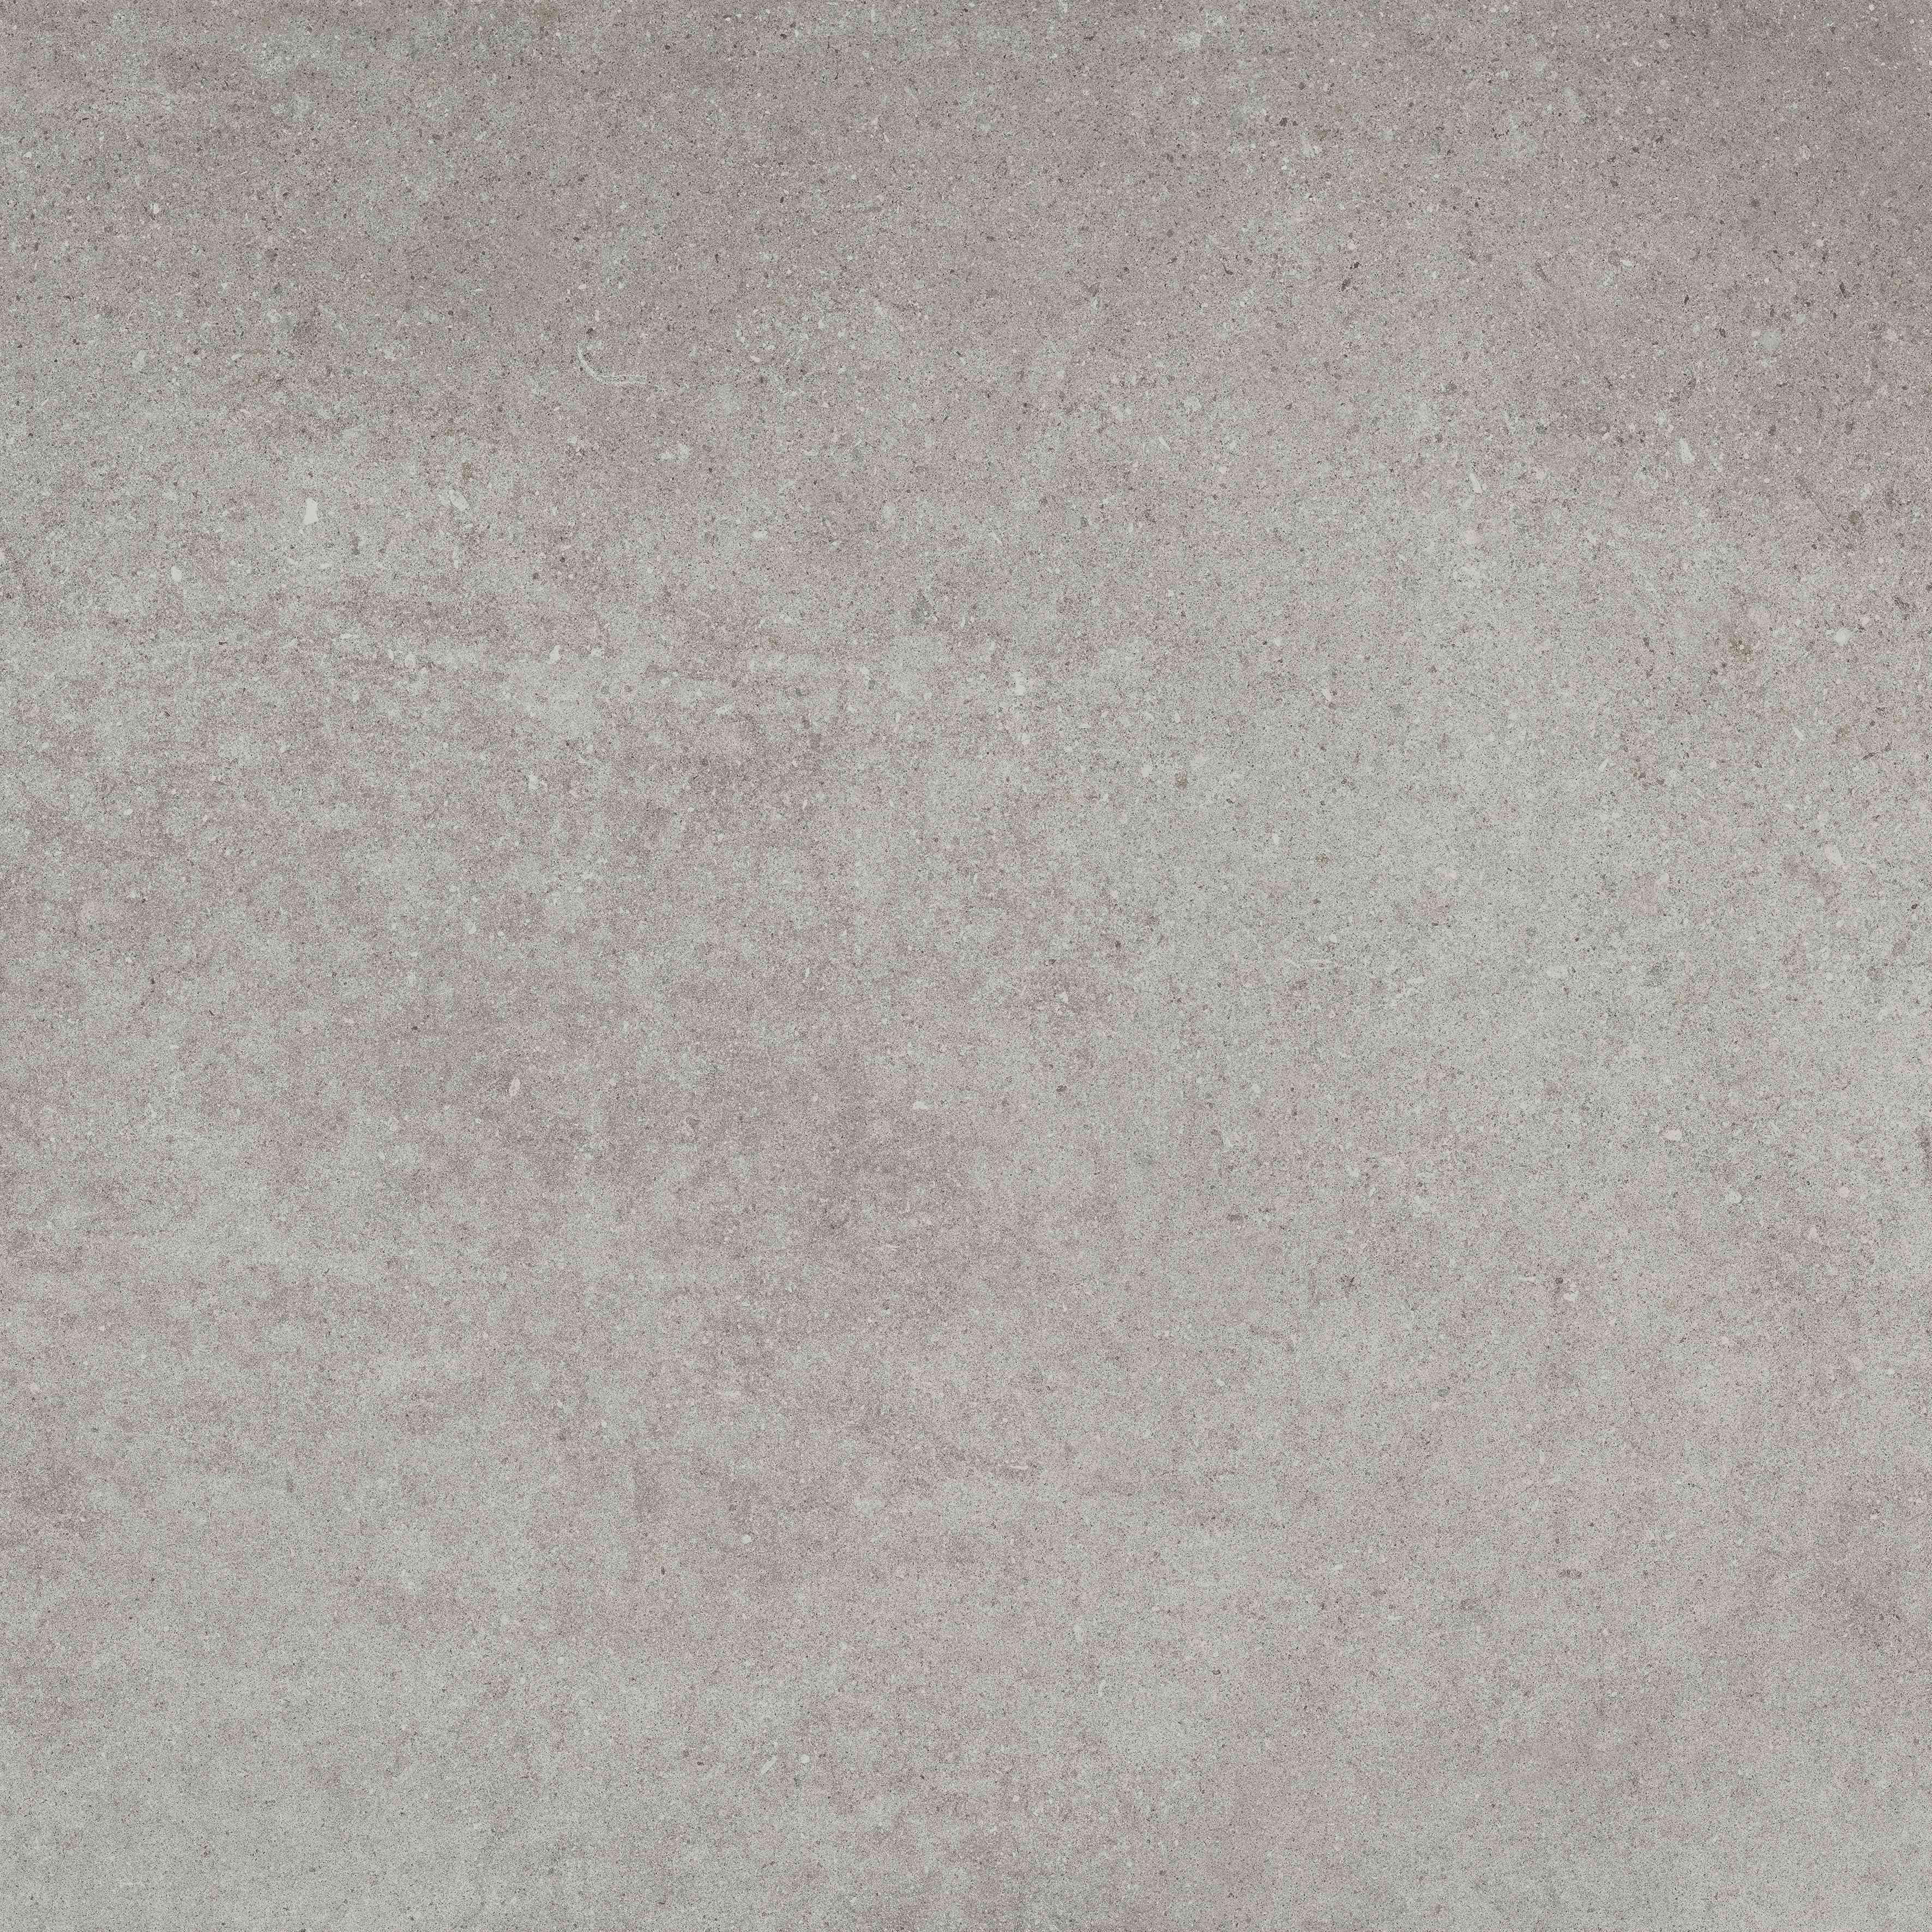 Плитка GRIGIO (ZRXRM8R) изображение 11